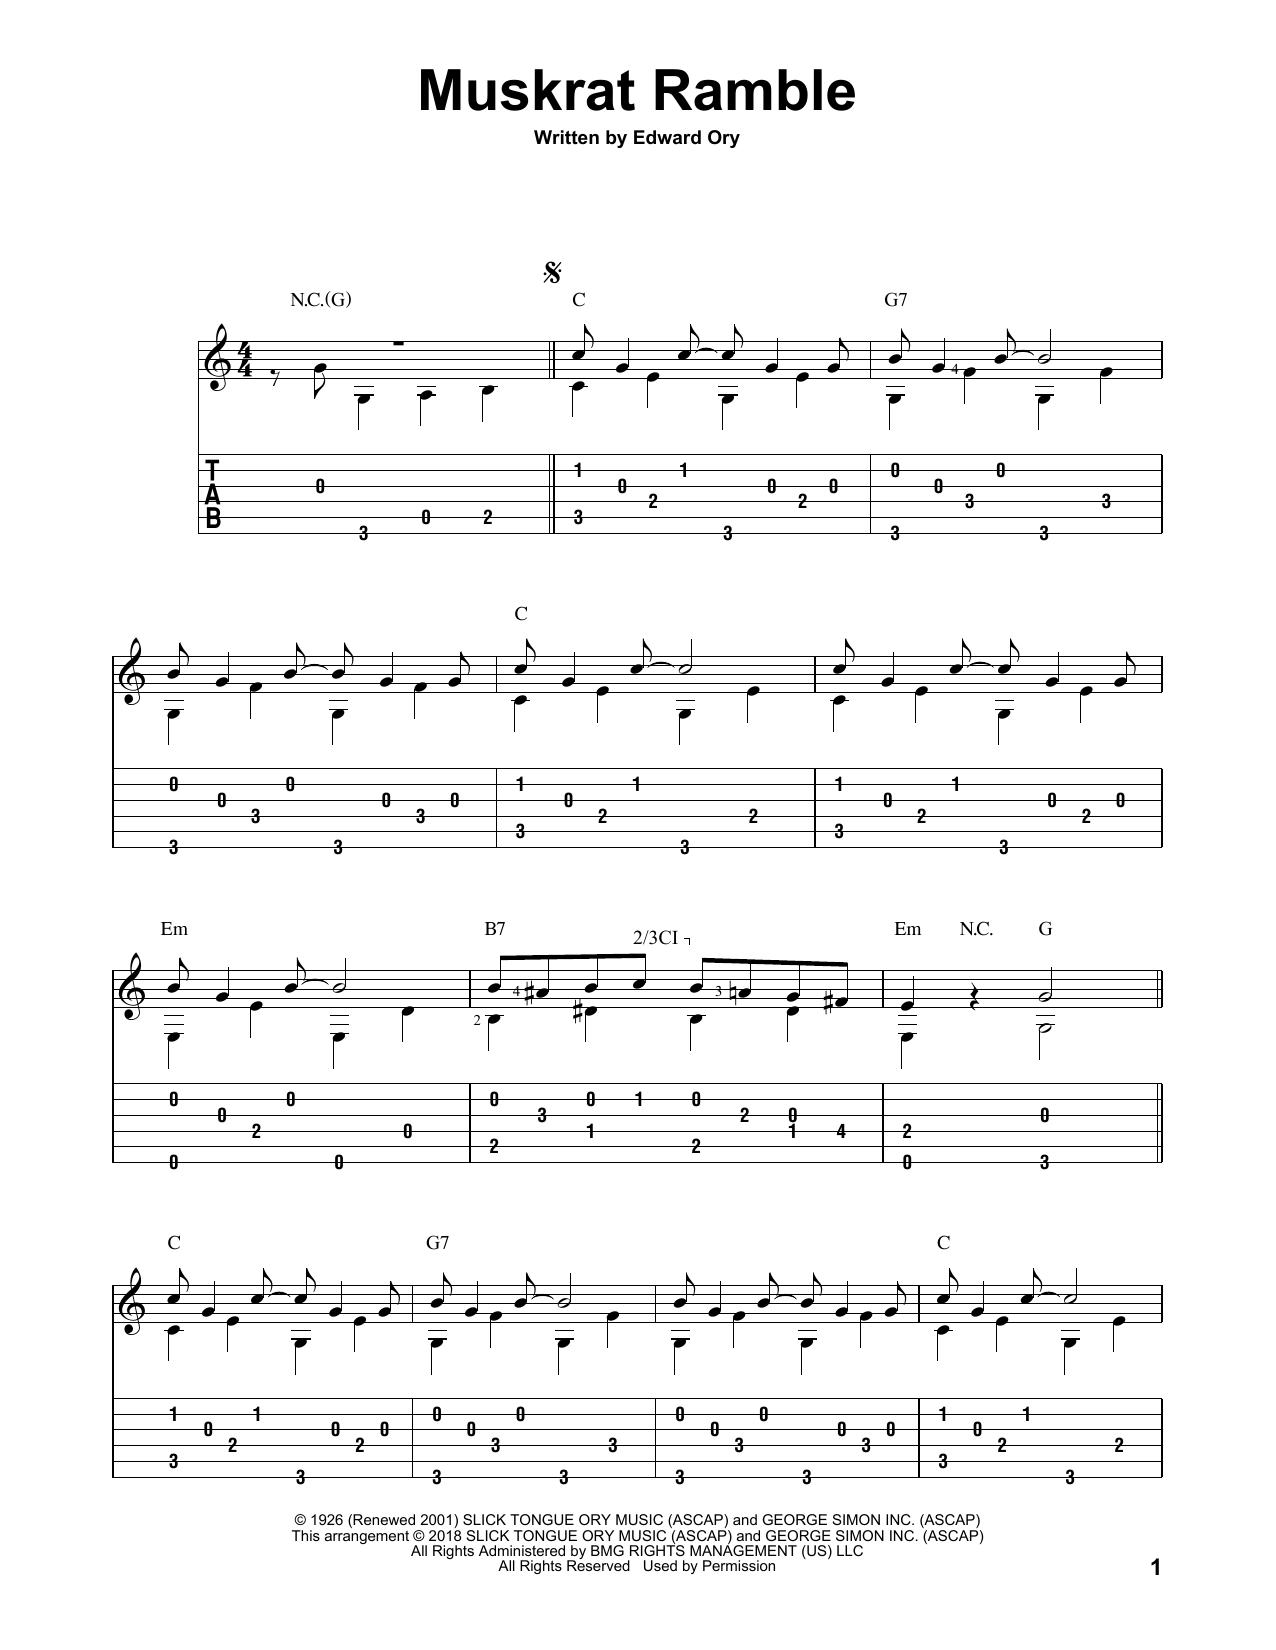 Muskrat Ramble (Solo Guitar Tab)